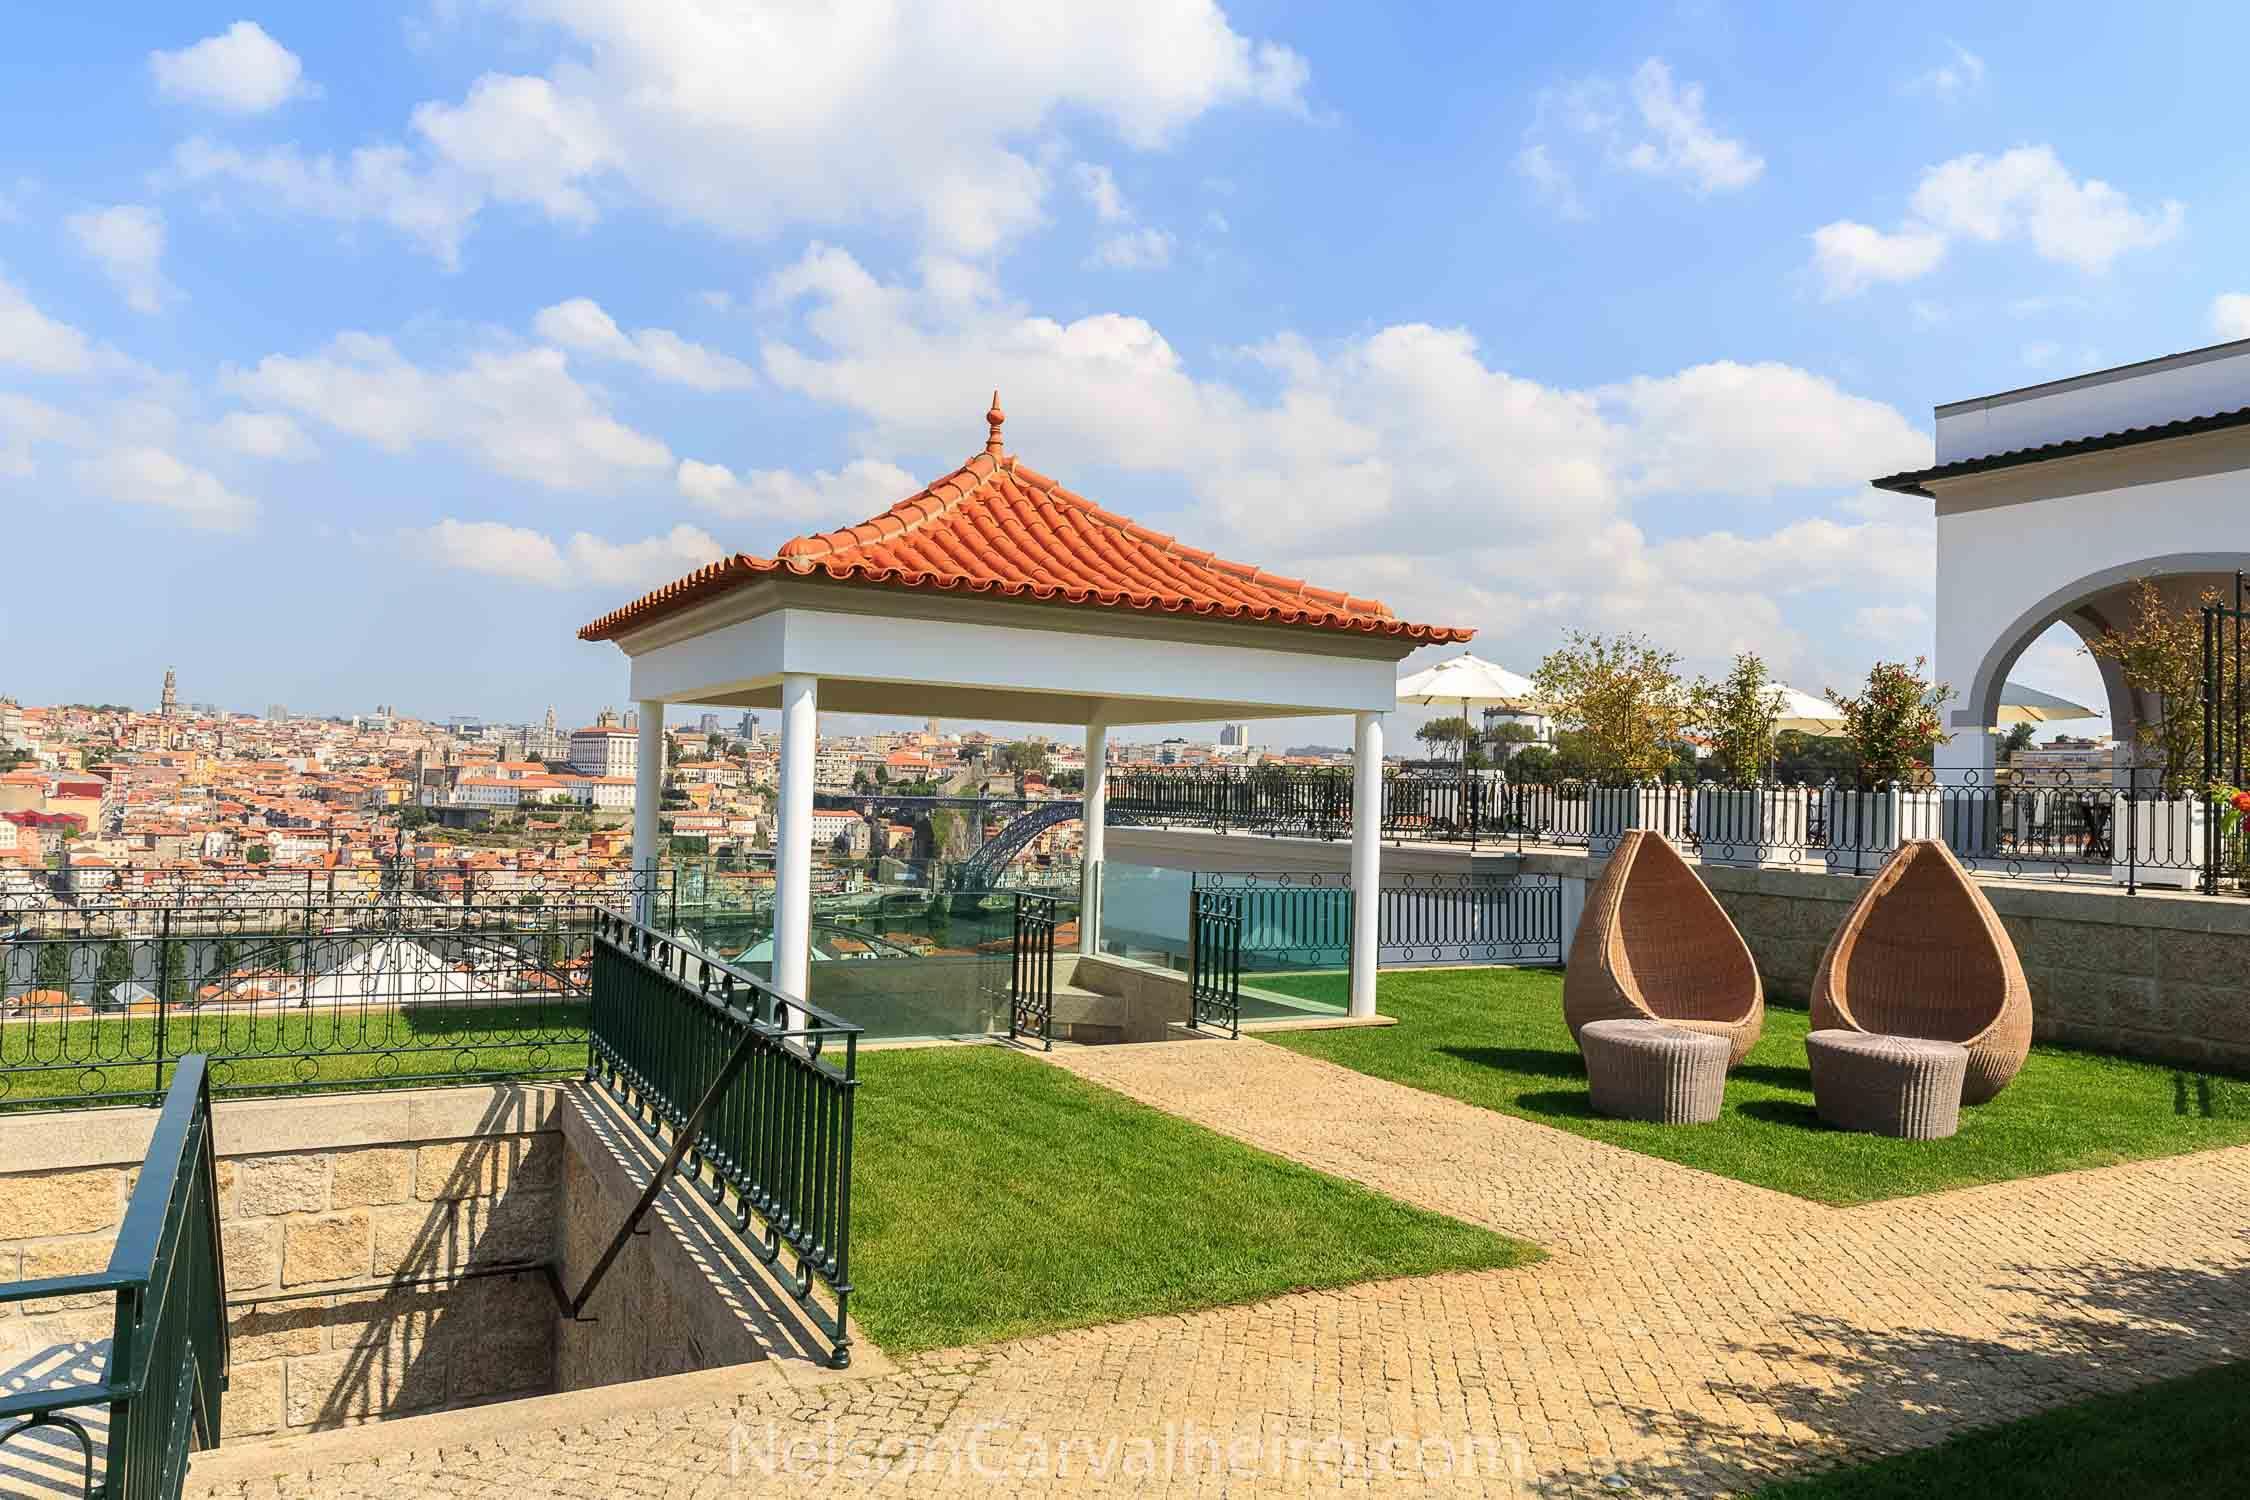 yeatman, amll luxury hotels of the world, best wine hotels in portugal, luxury hotel in porto, best hotels in porto, port wine cellars